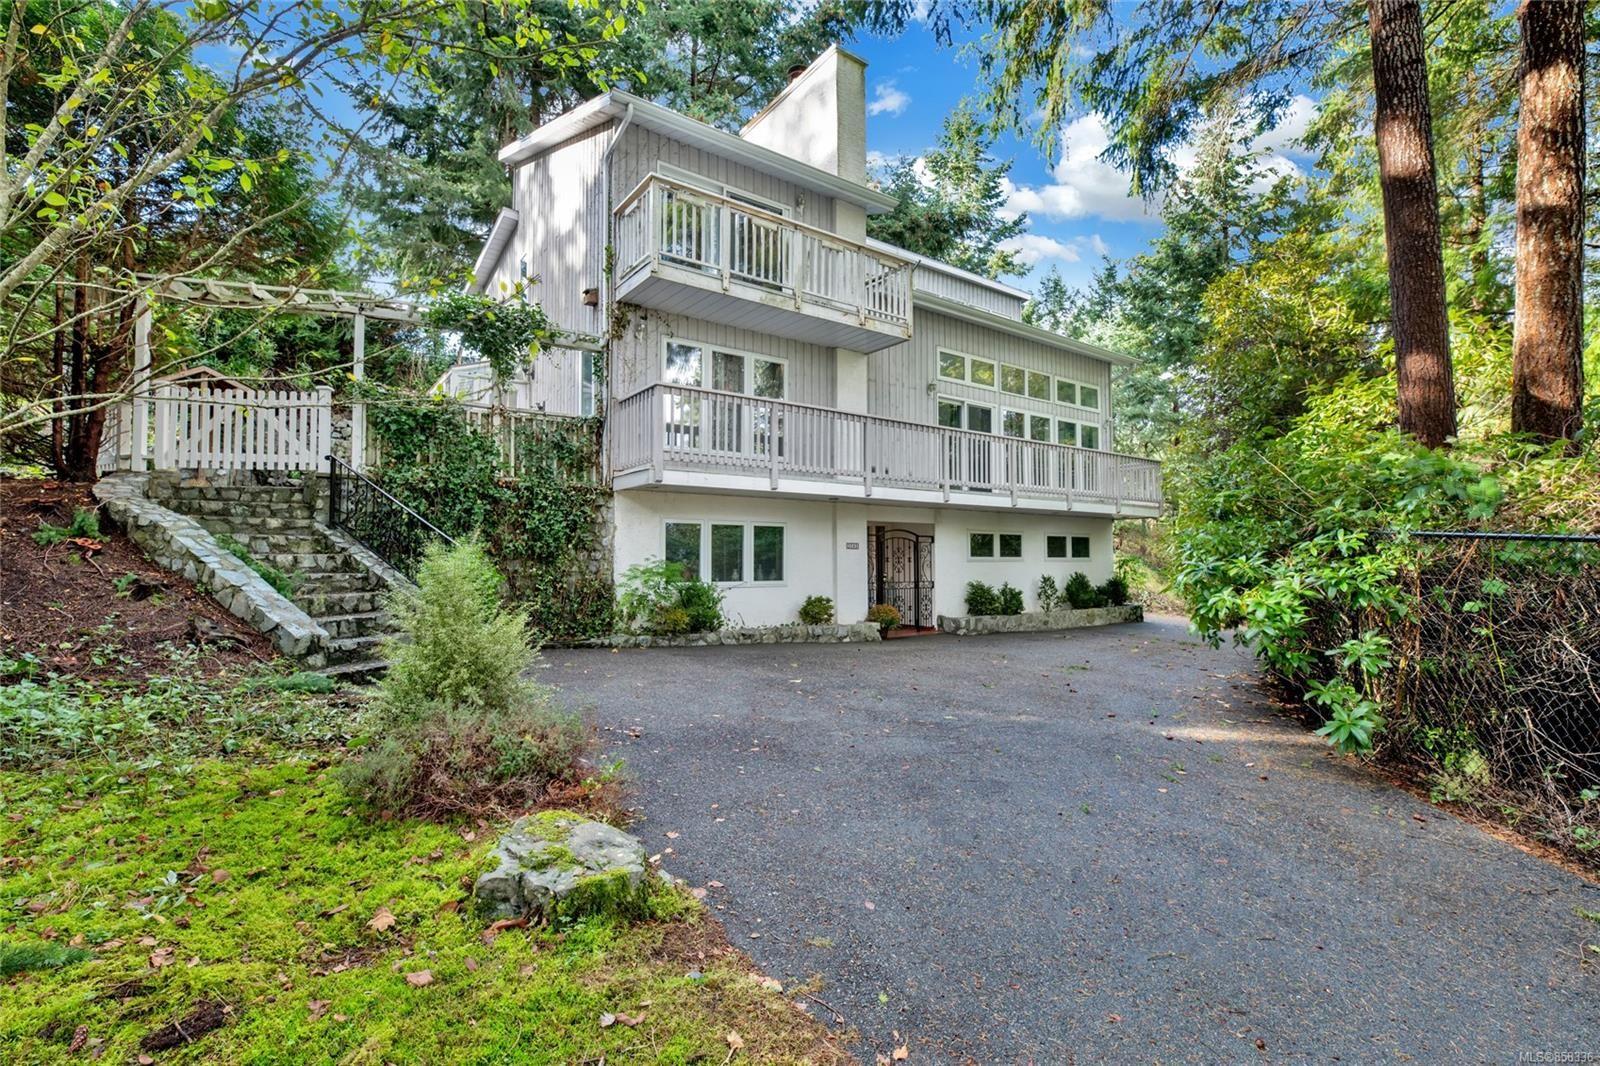 Main Photo: 3565 Hammond Bay Rd in : Na Hammond Bay House for sale (Nanaimo)  : MLS®# 858336